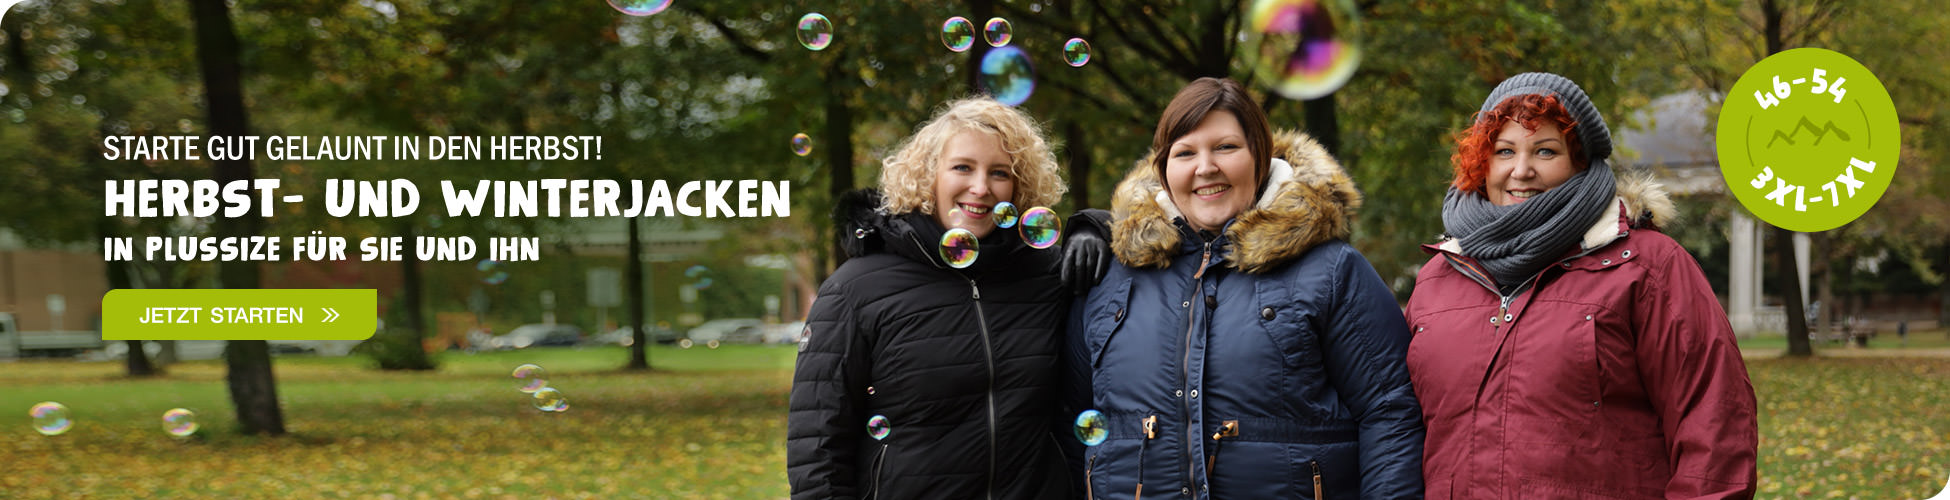 11_20 Herbst-Winterjacken